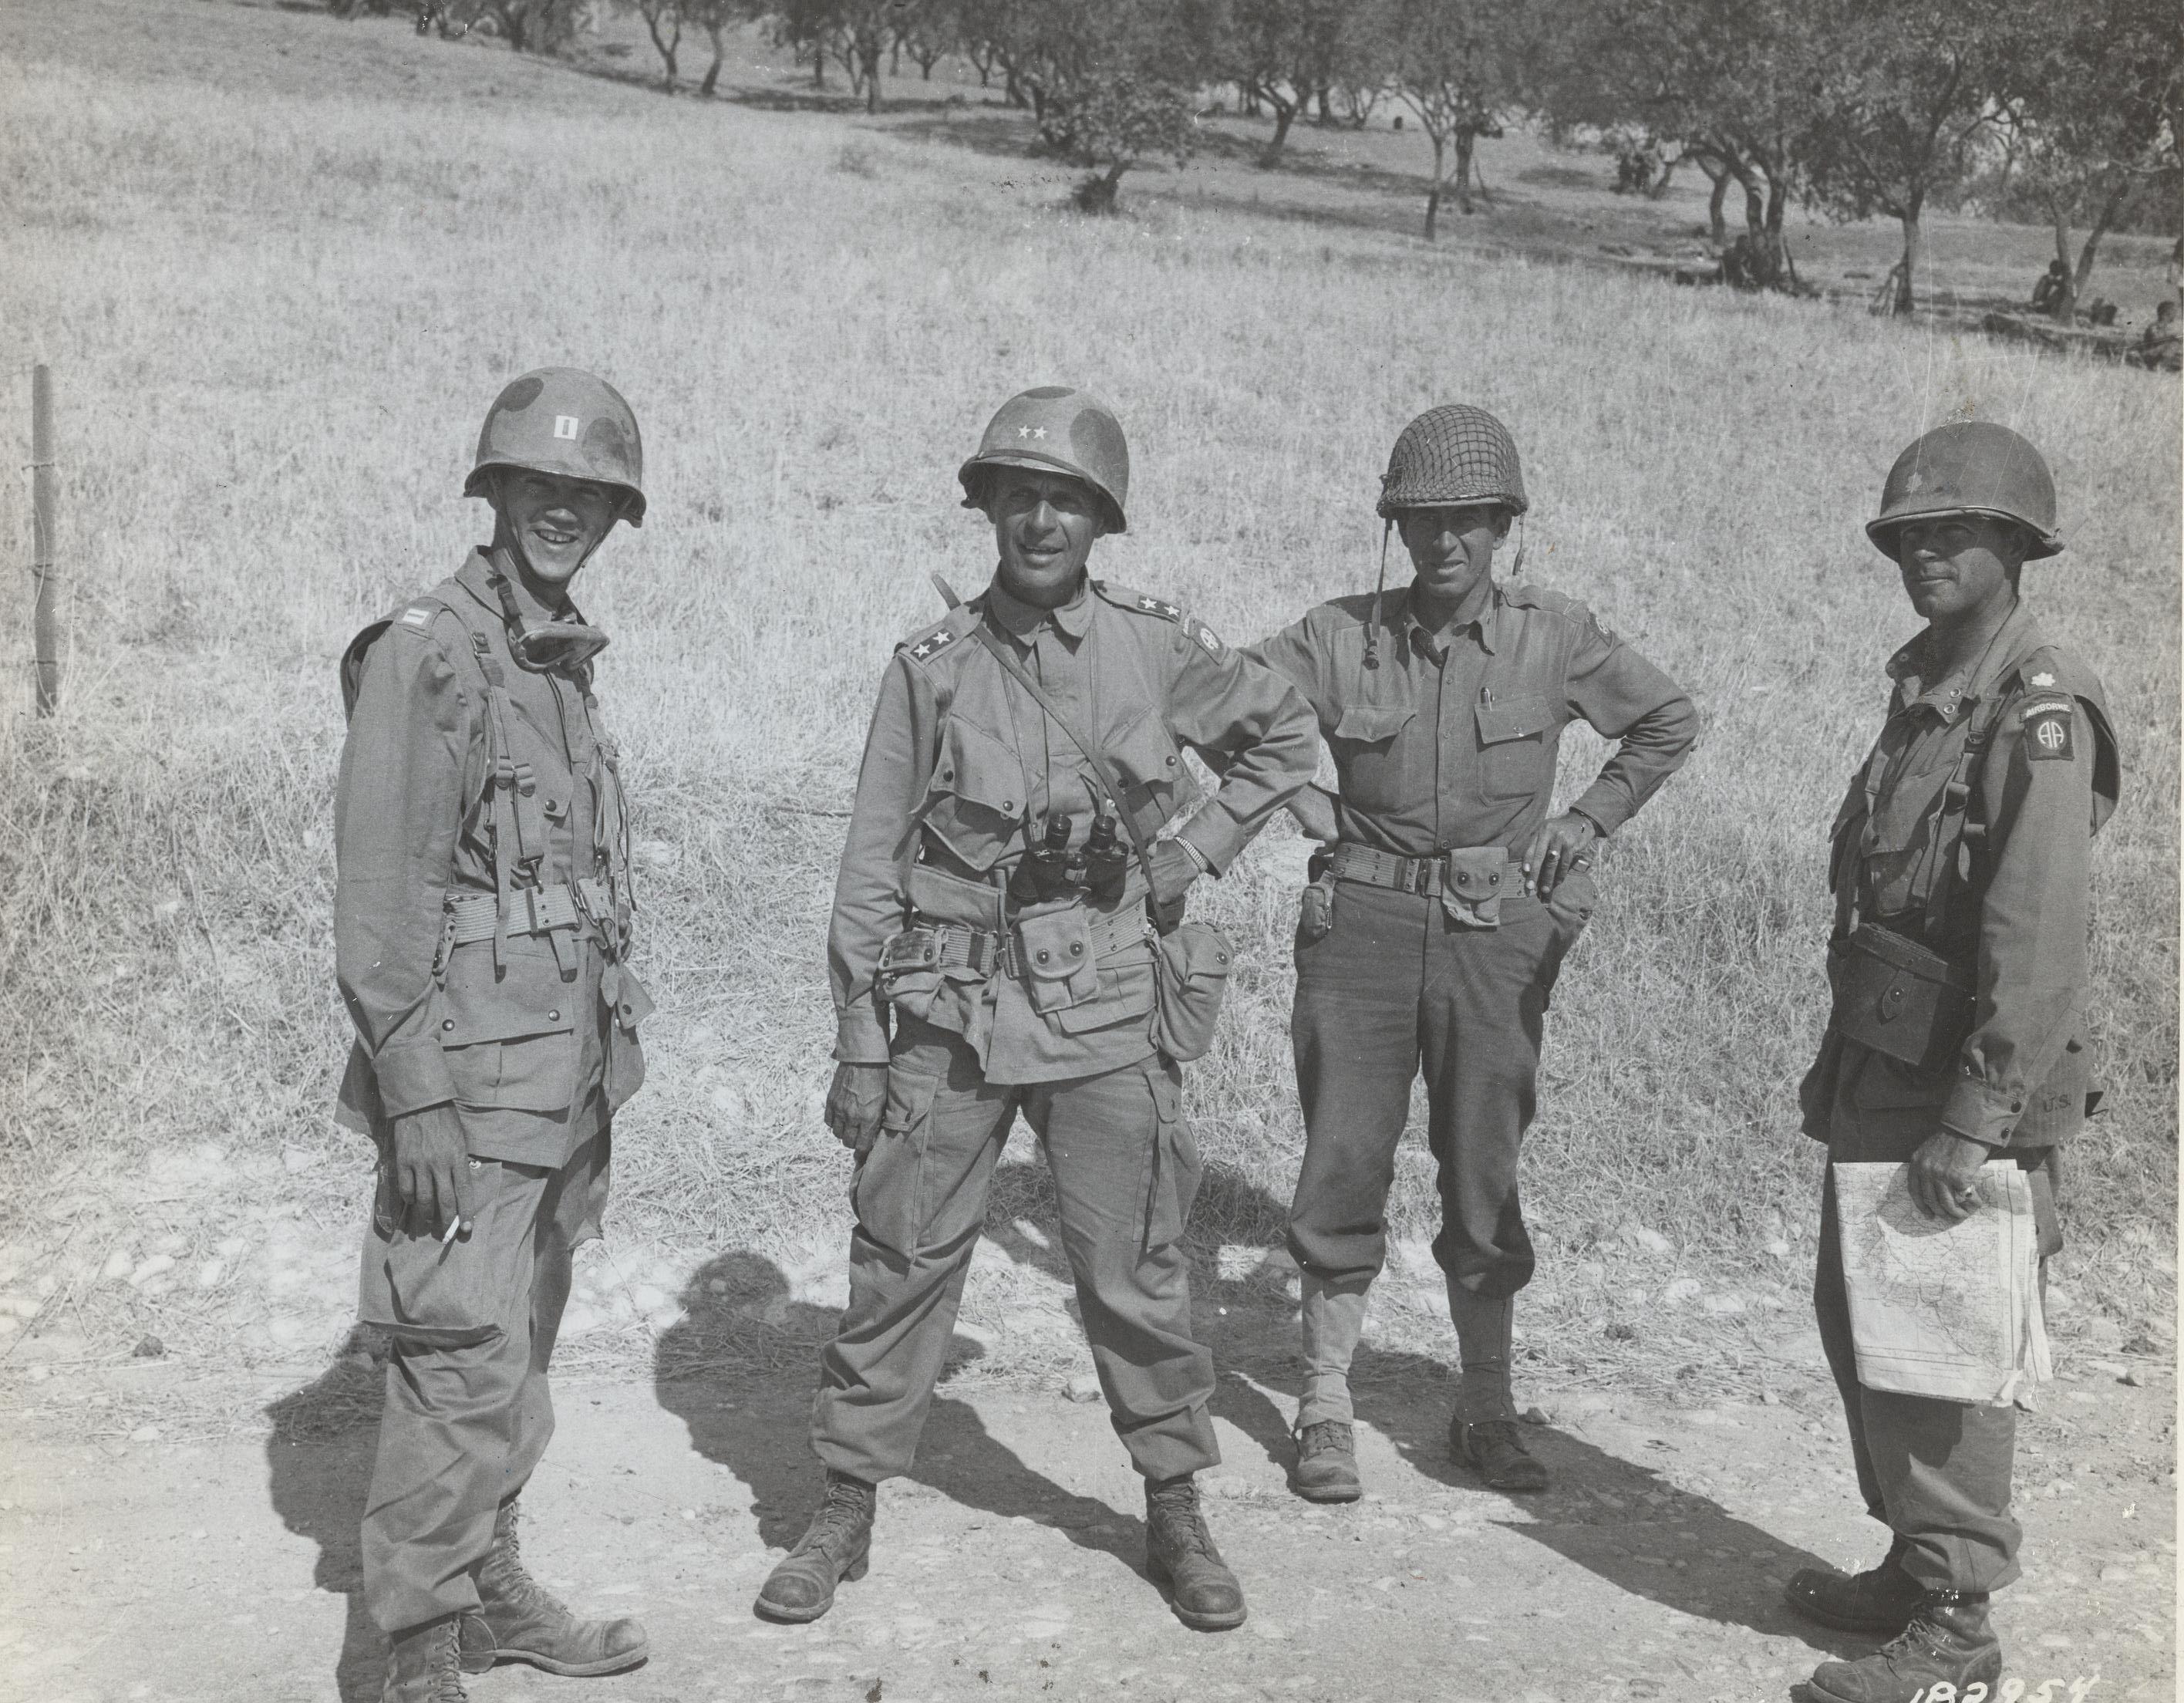 Matthew Ridgway, Sicily, July 1943